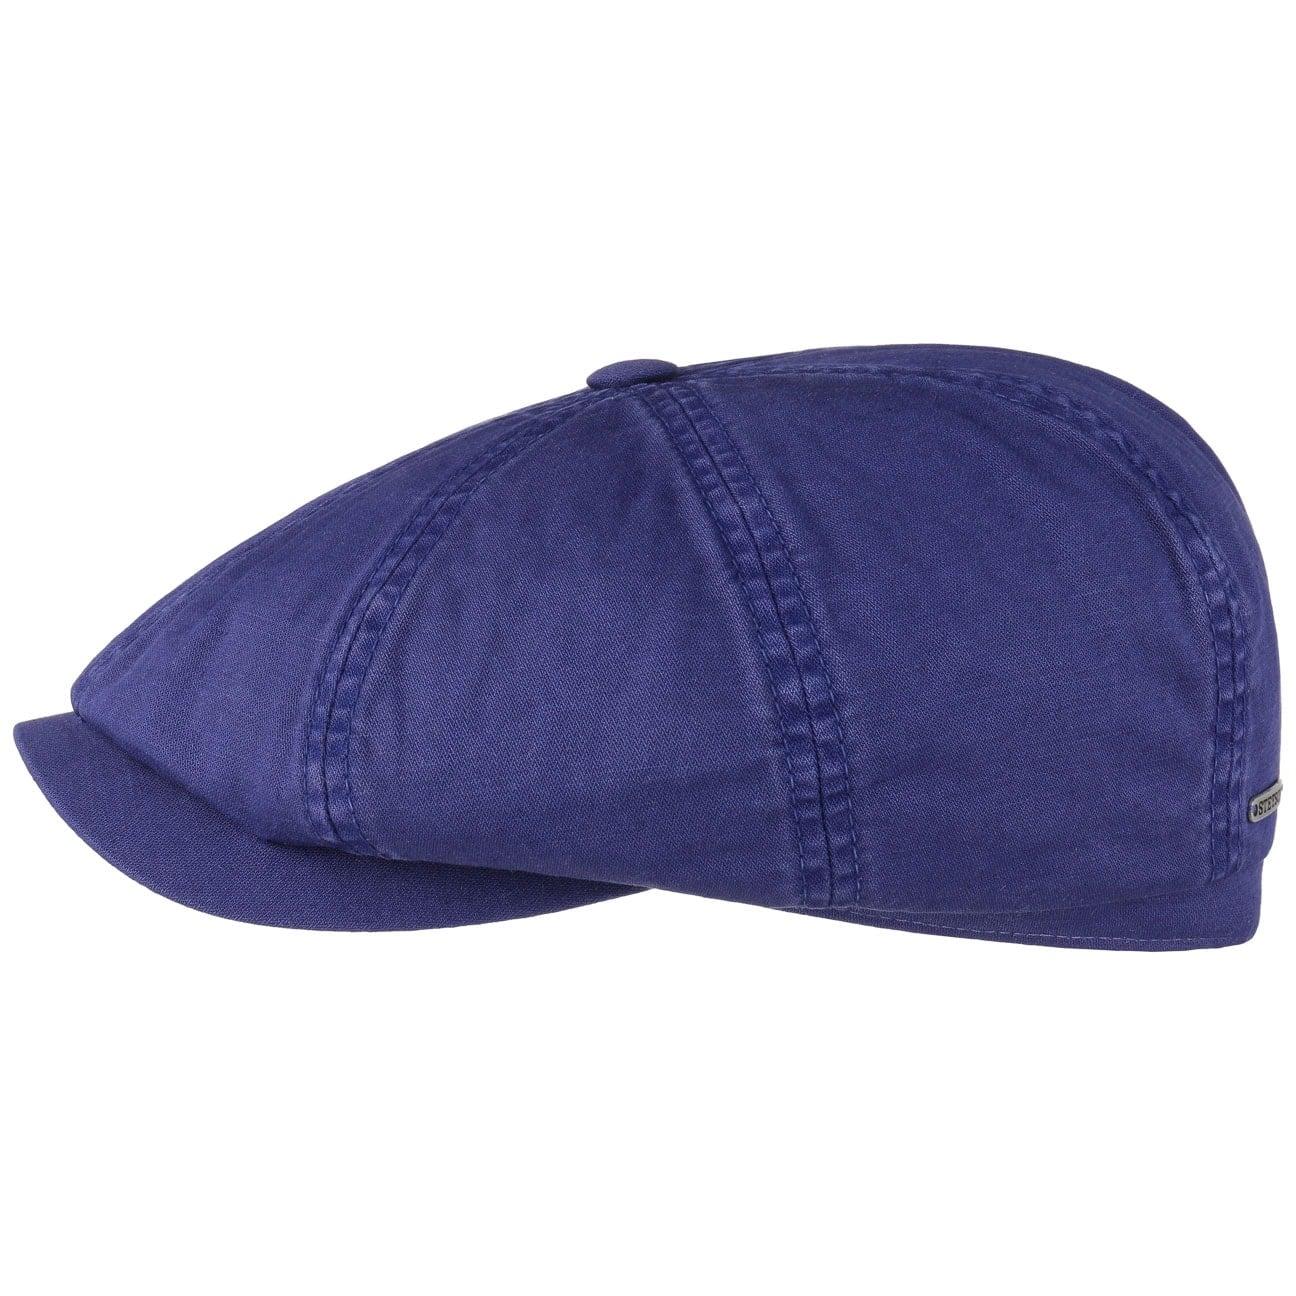 gorra-hatteras-dye-by-stetson, 69.00 EUR @ sombreroshop-es